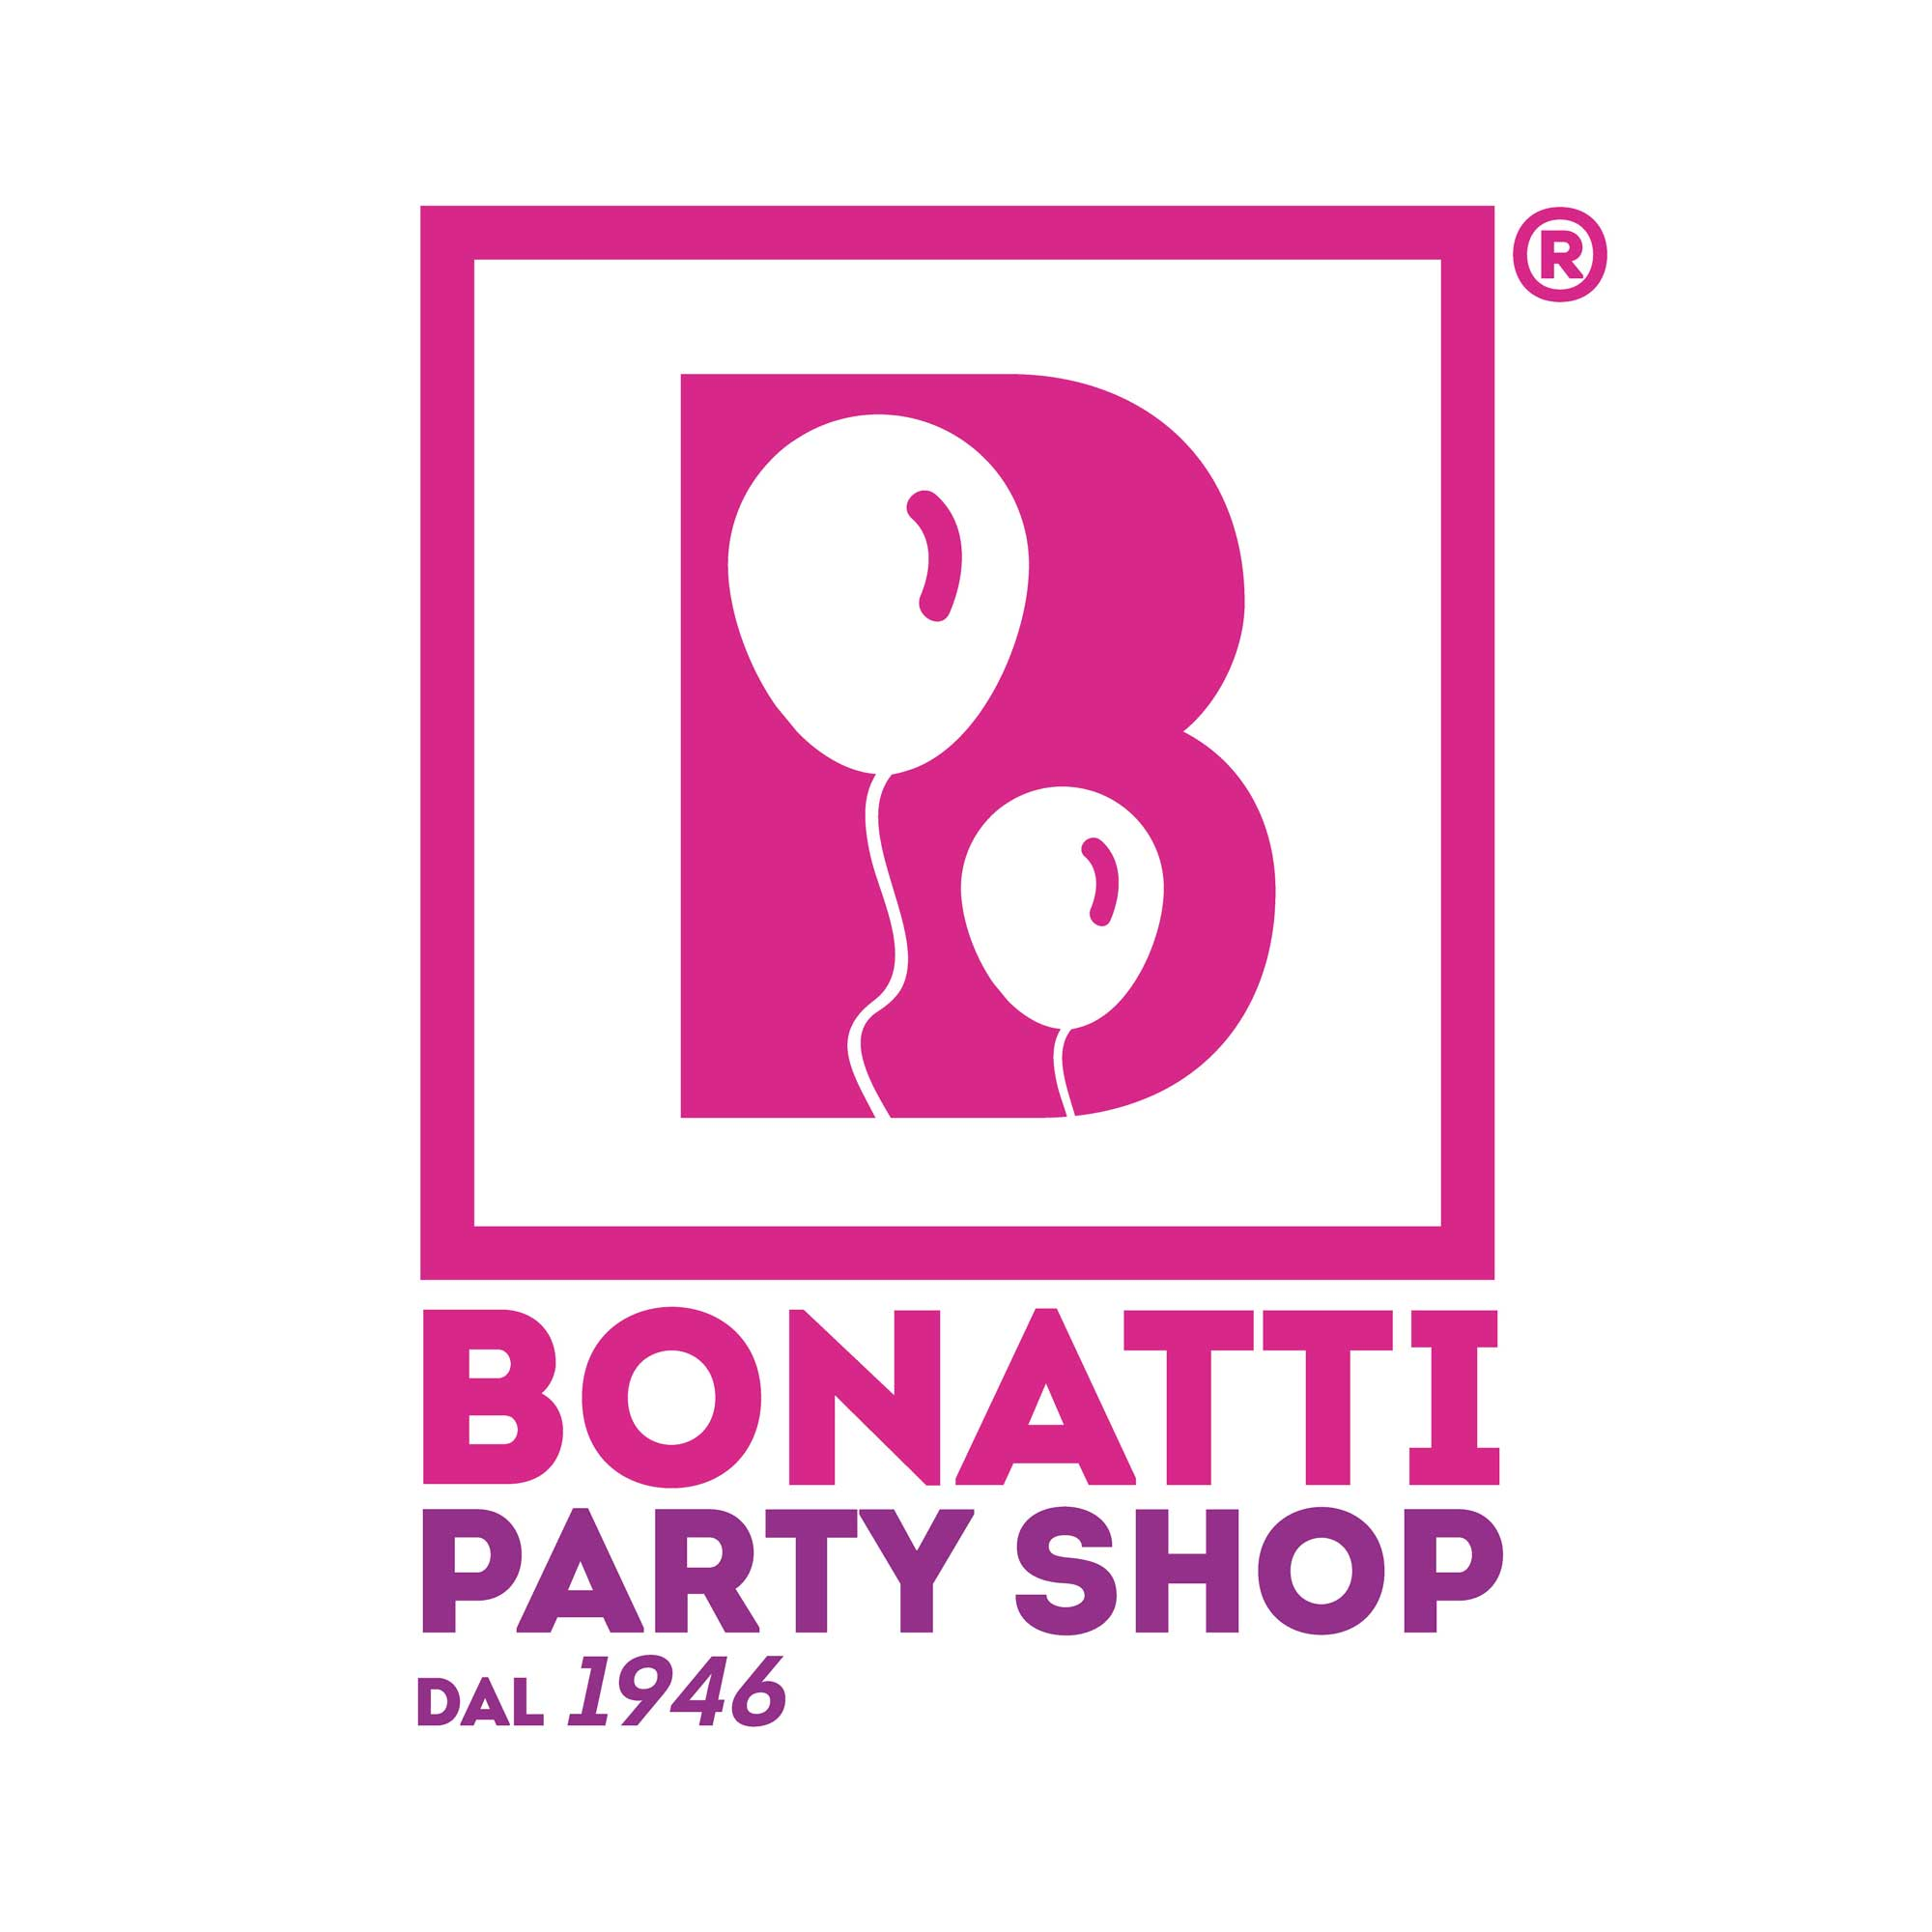 Bonatti Party Shop